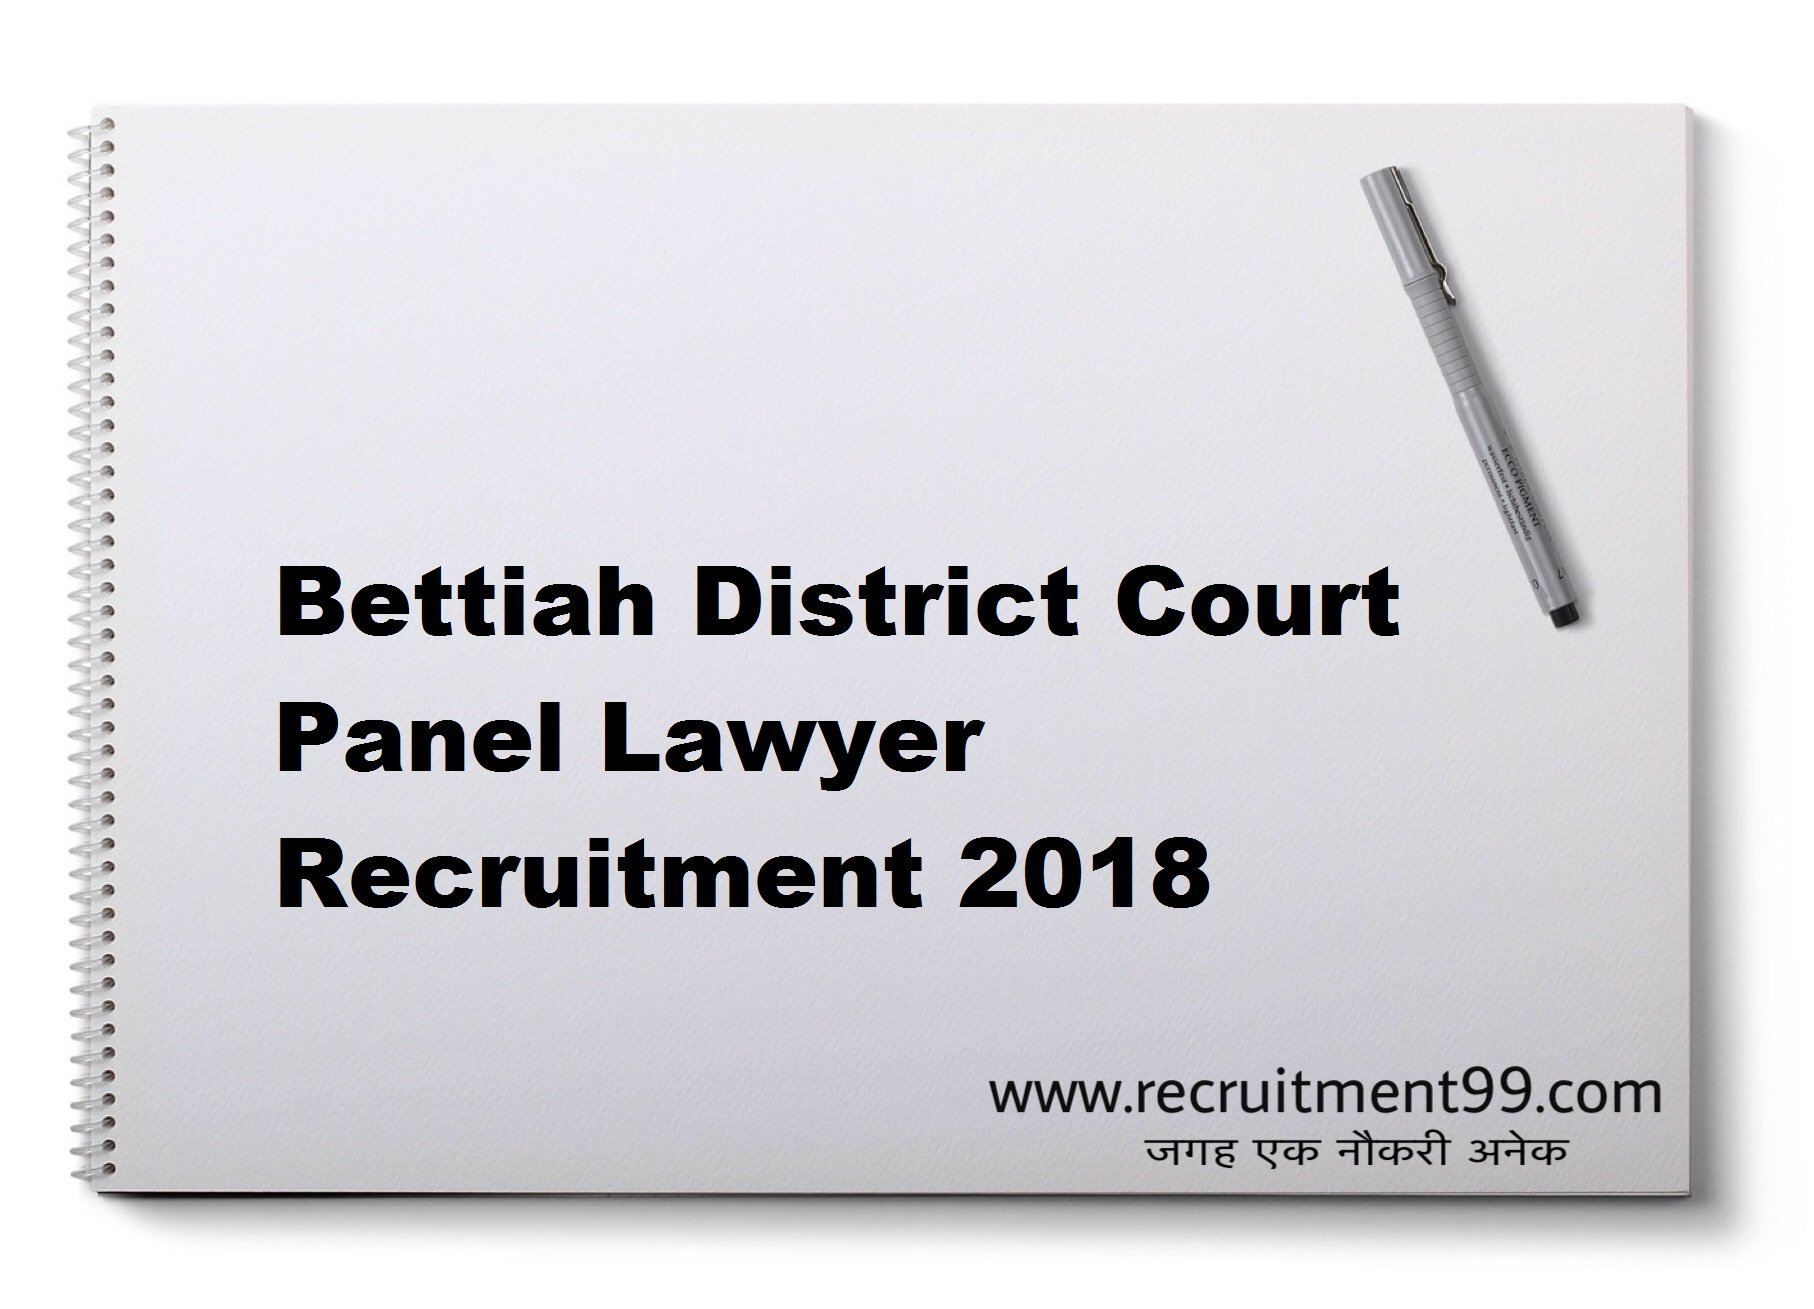 Bettiah District Court Panel Lawyer Recruitment Admit Card Result 2018